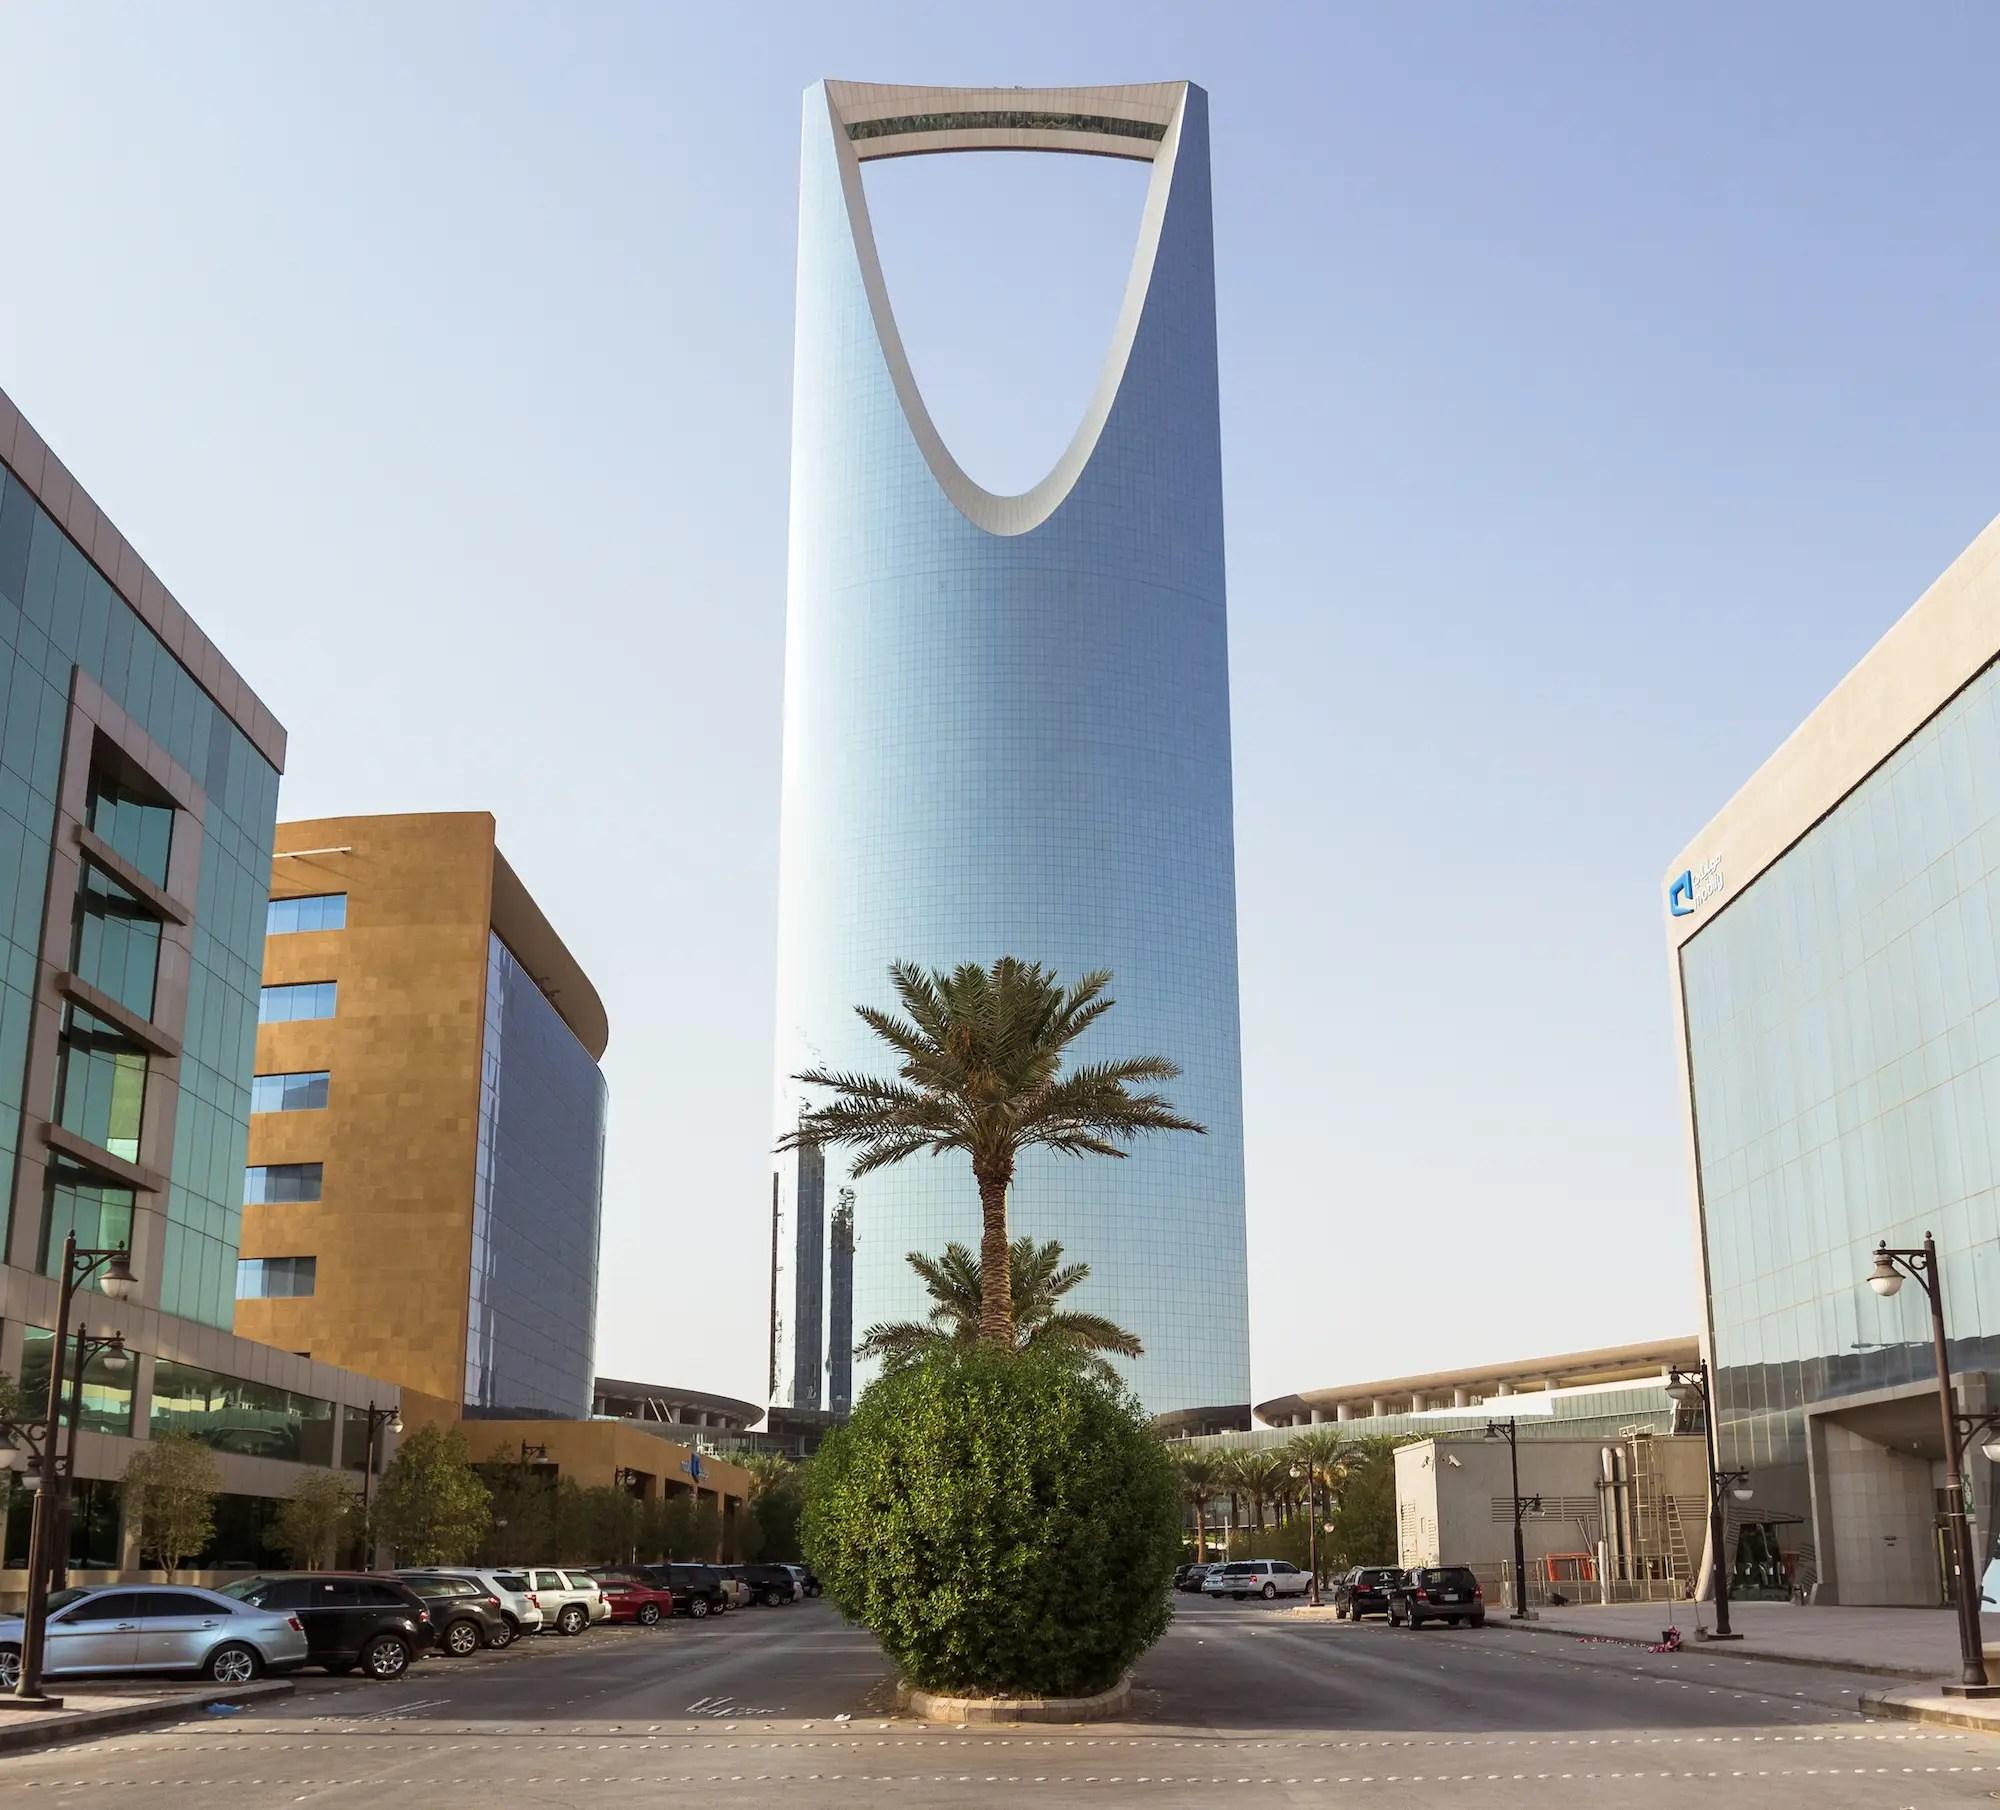 64. The razor-like Kingdom Centre overlooks Riyadh city, Saudi Arabia.